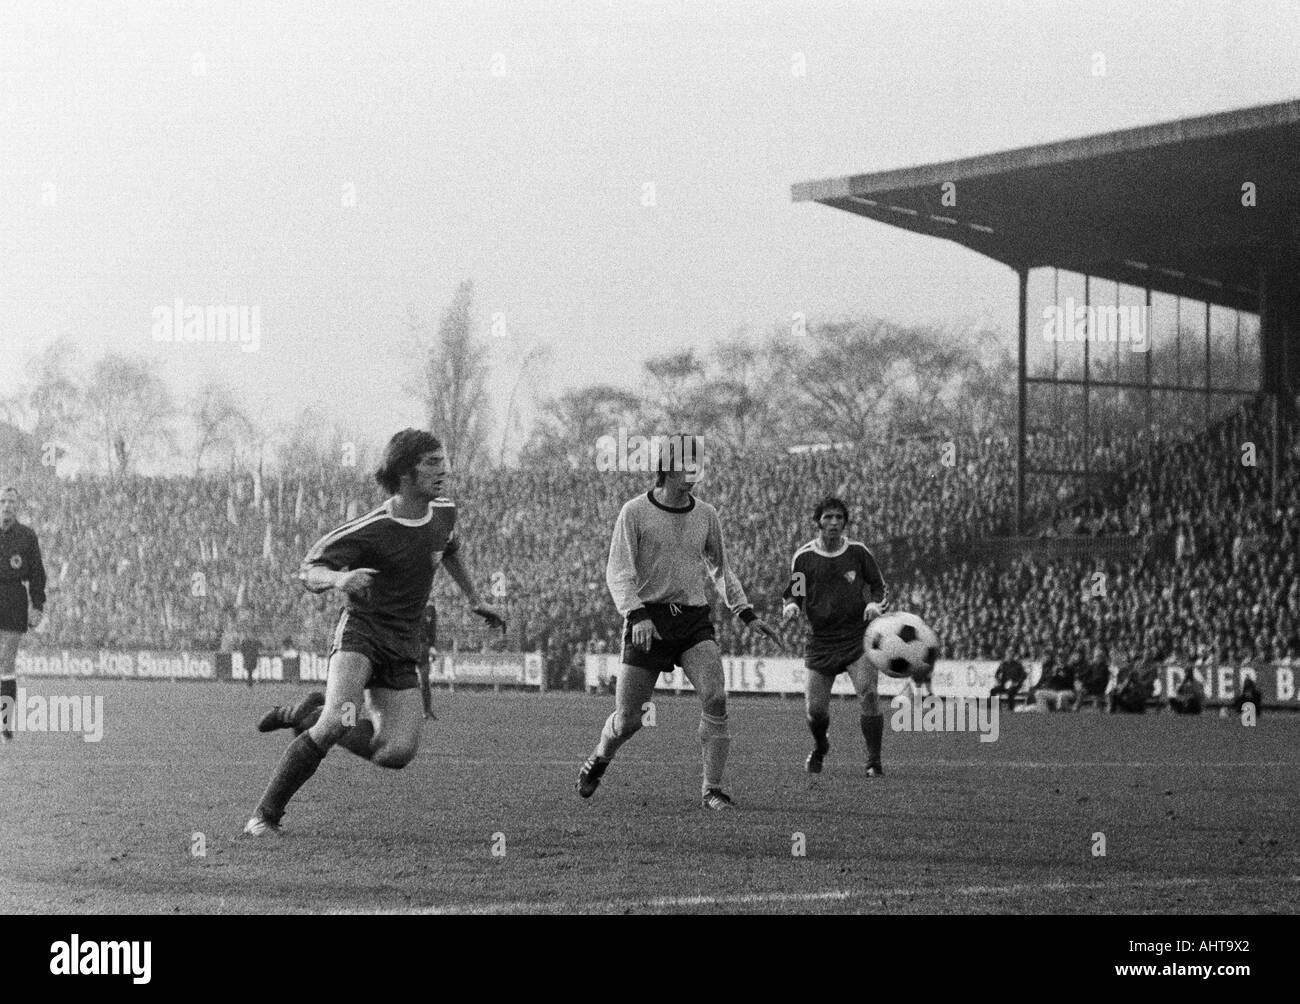 football, Bundesliga, 1971/1972, VfL Bochum versus Borussia Dortmund 4:2, Stadium at the Castroper Strasse in Bochum, scene of the match, f.l.t.r. Hans Walitza (Bochum), Theodor Rielaender (BVB), Dieter Fern (Bochum) - Stock Image